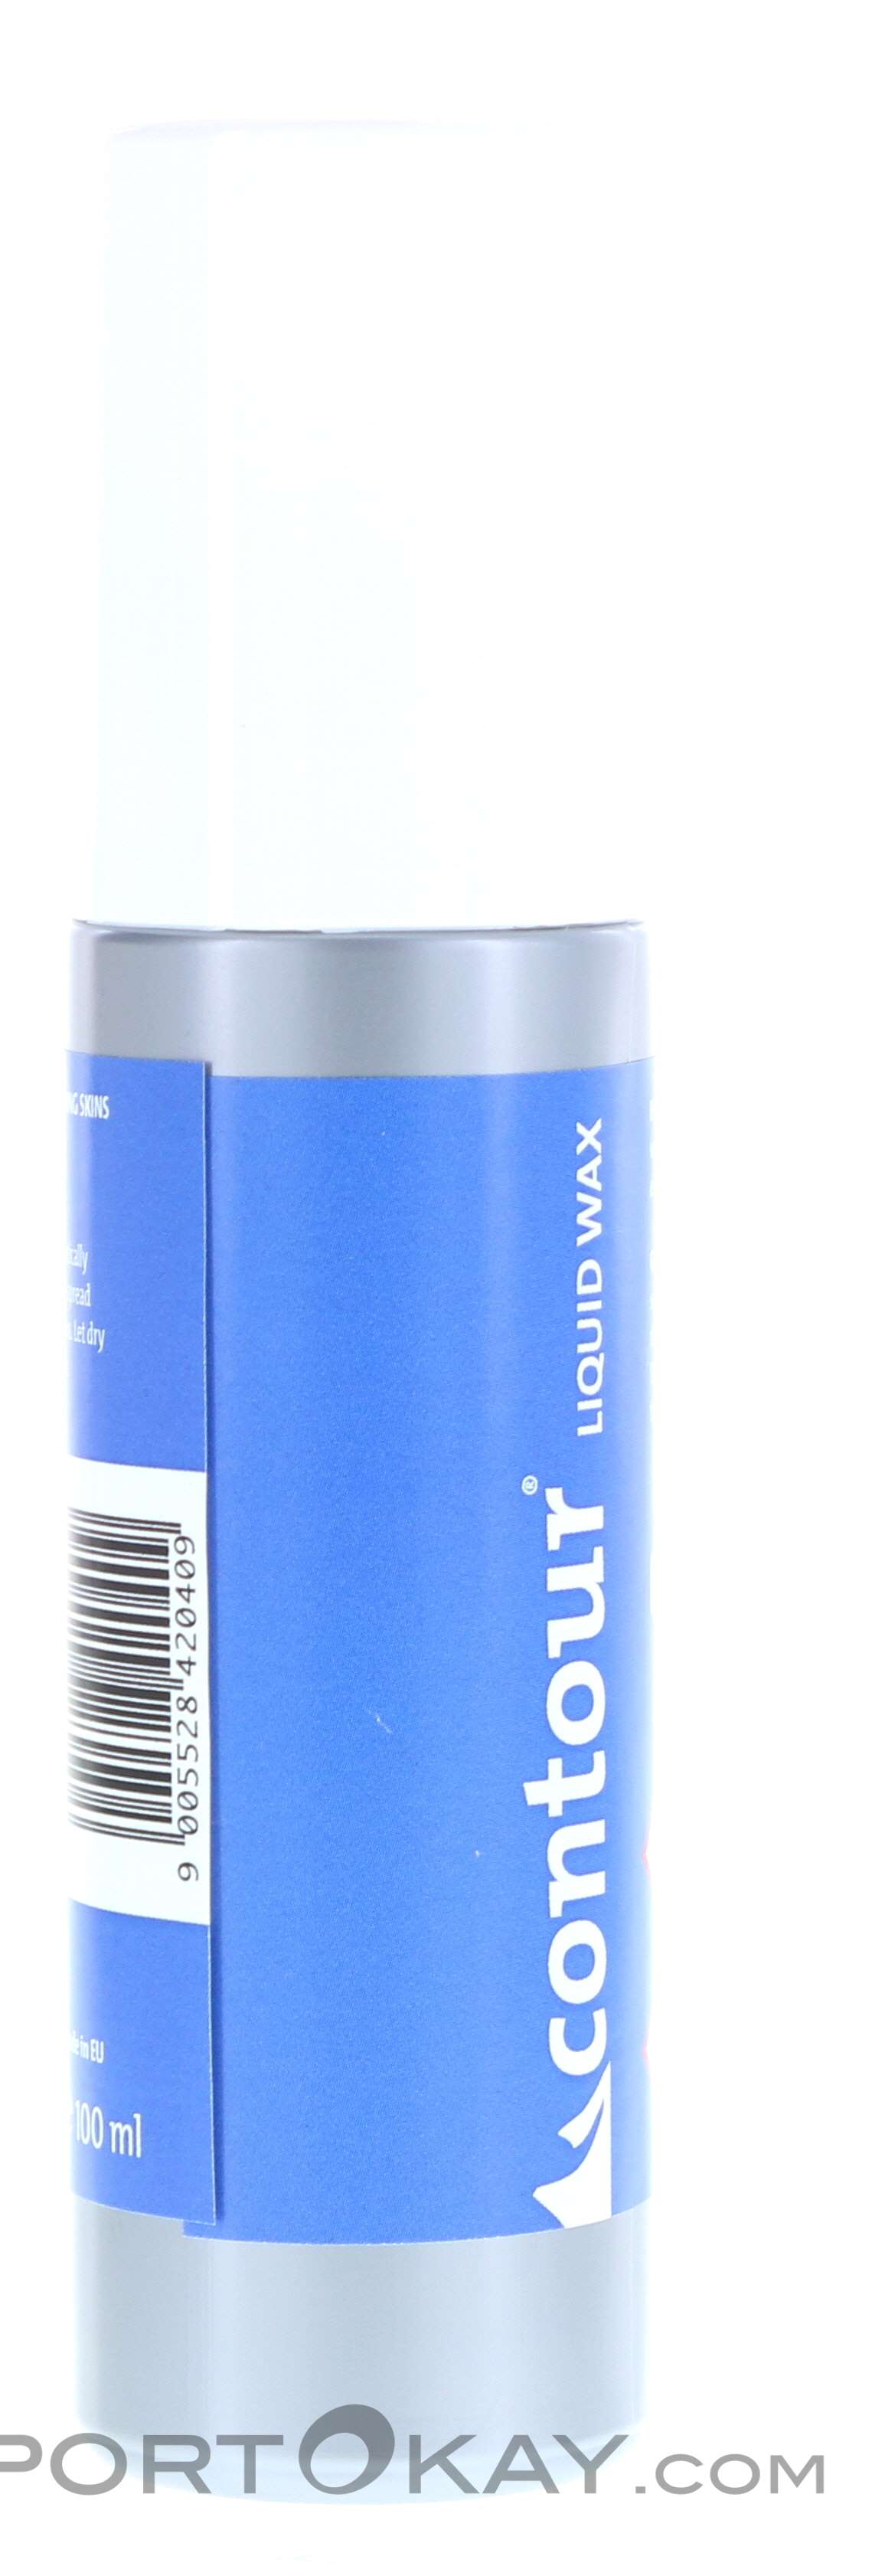 Contour Contour Liquid Wax 100ml Wachs